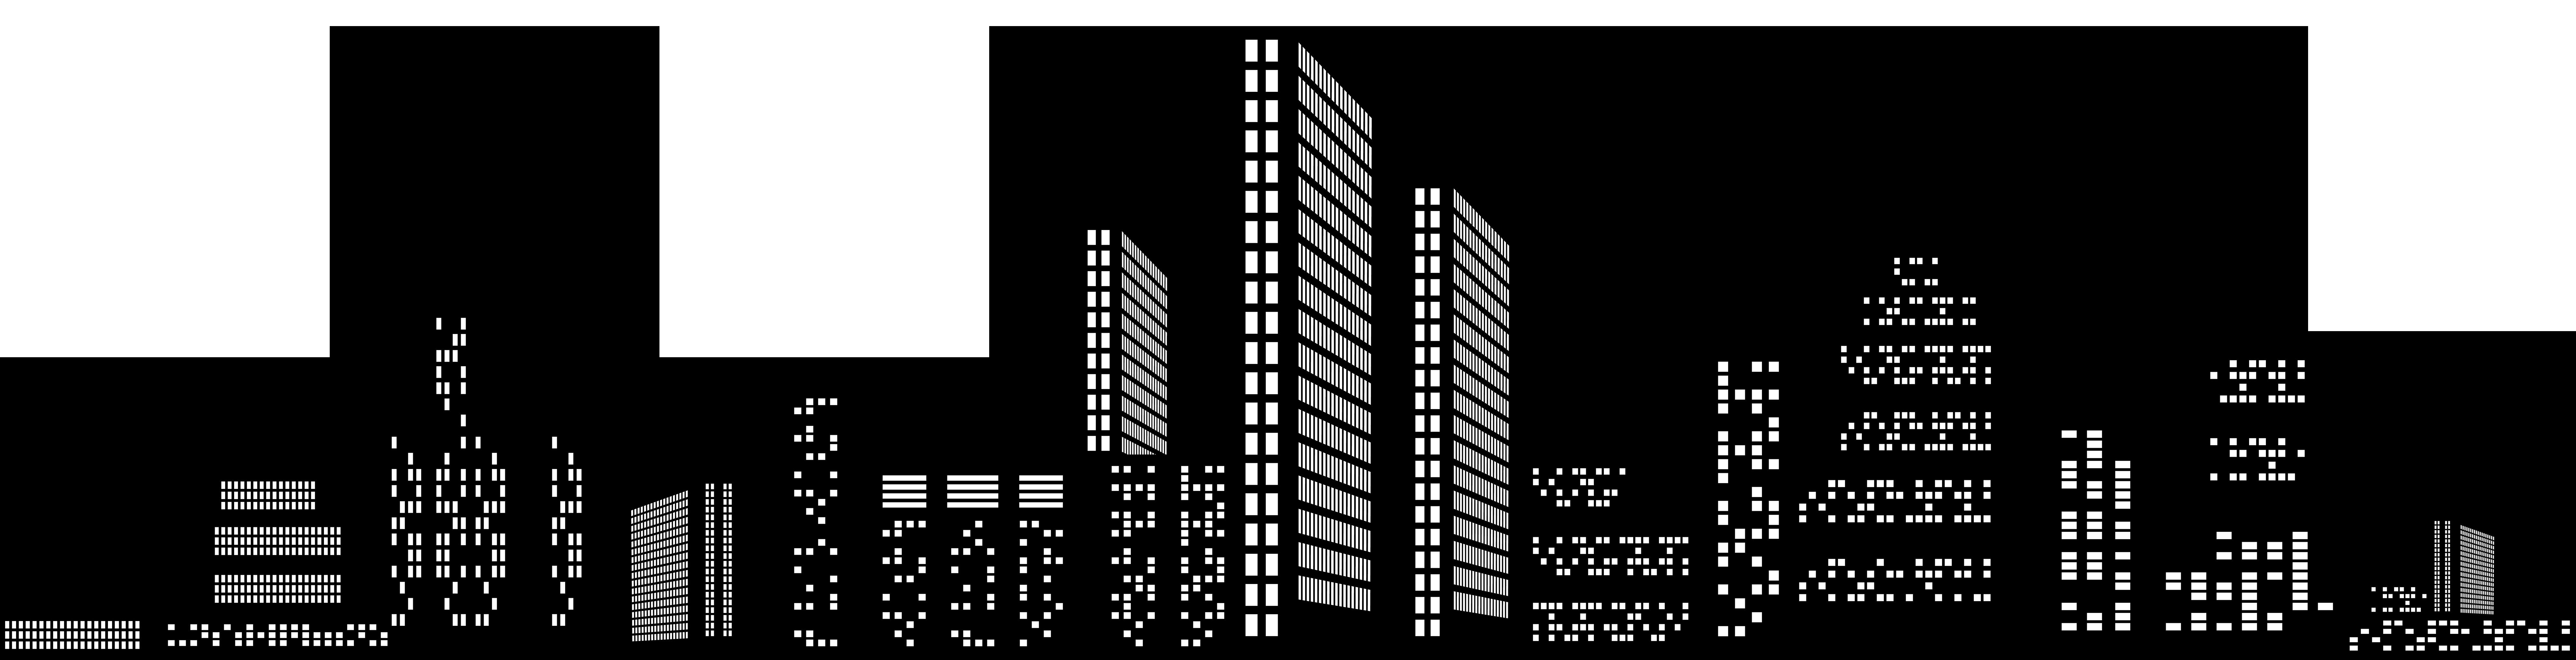 Cityscape silhouette clip art. City clipart metropolitan area